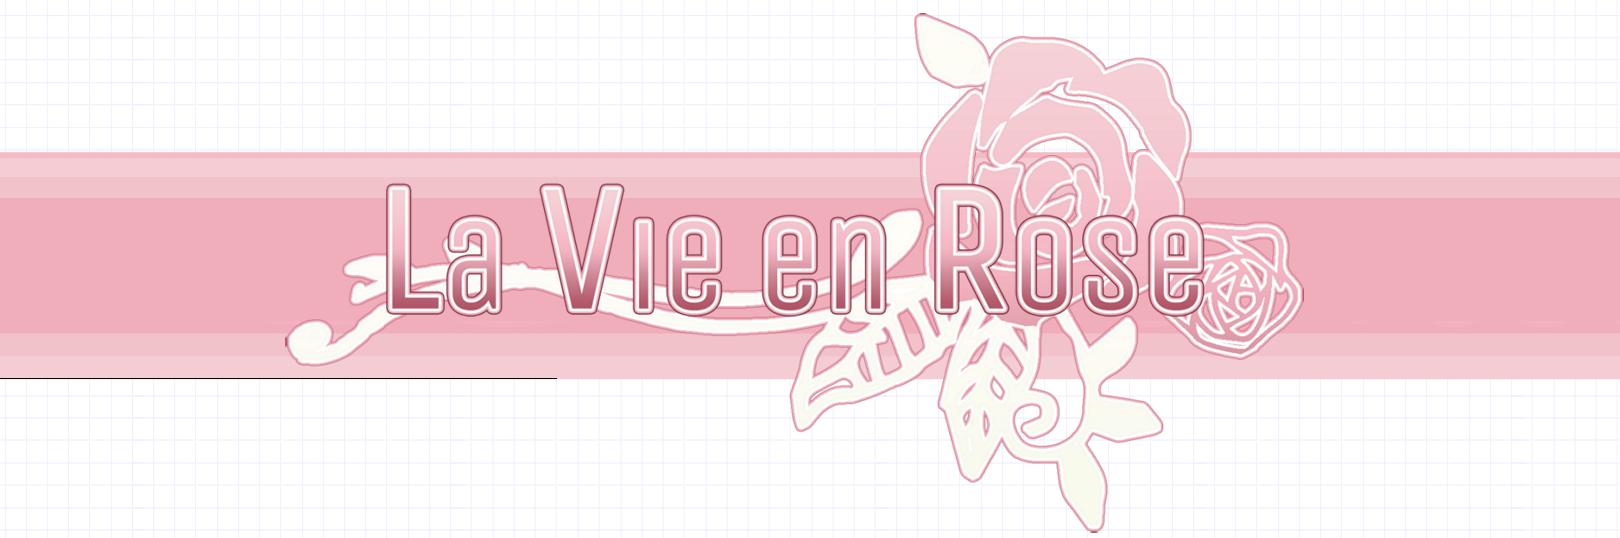 La Vie en Rose [Demo]